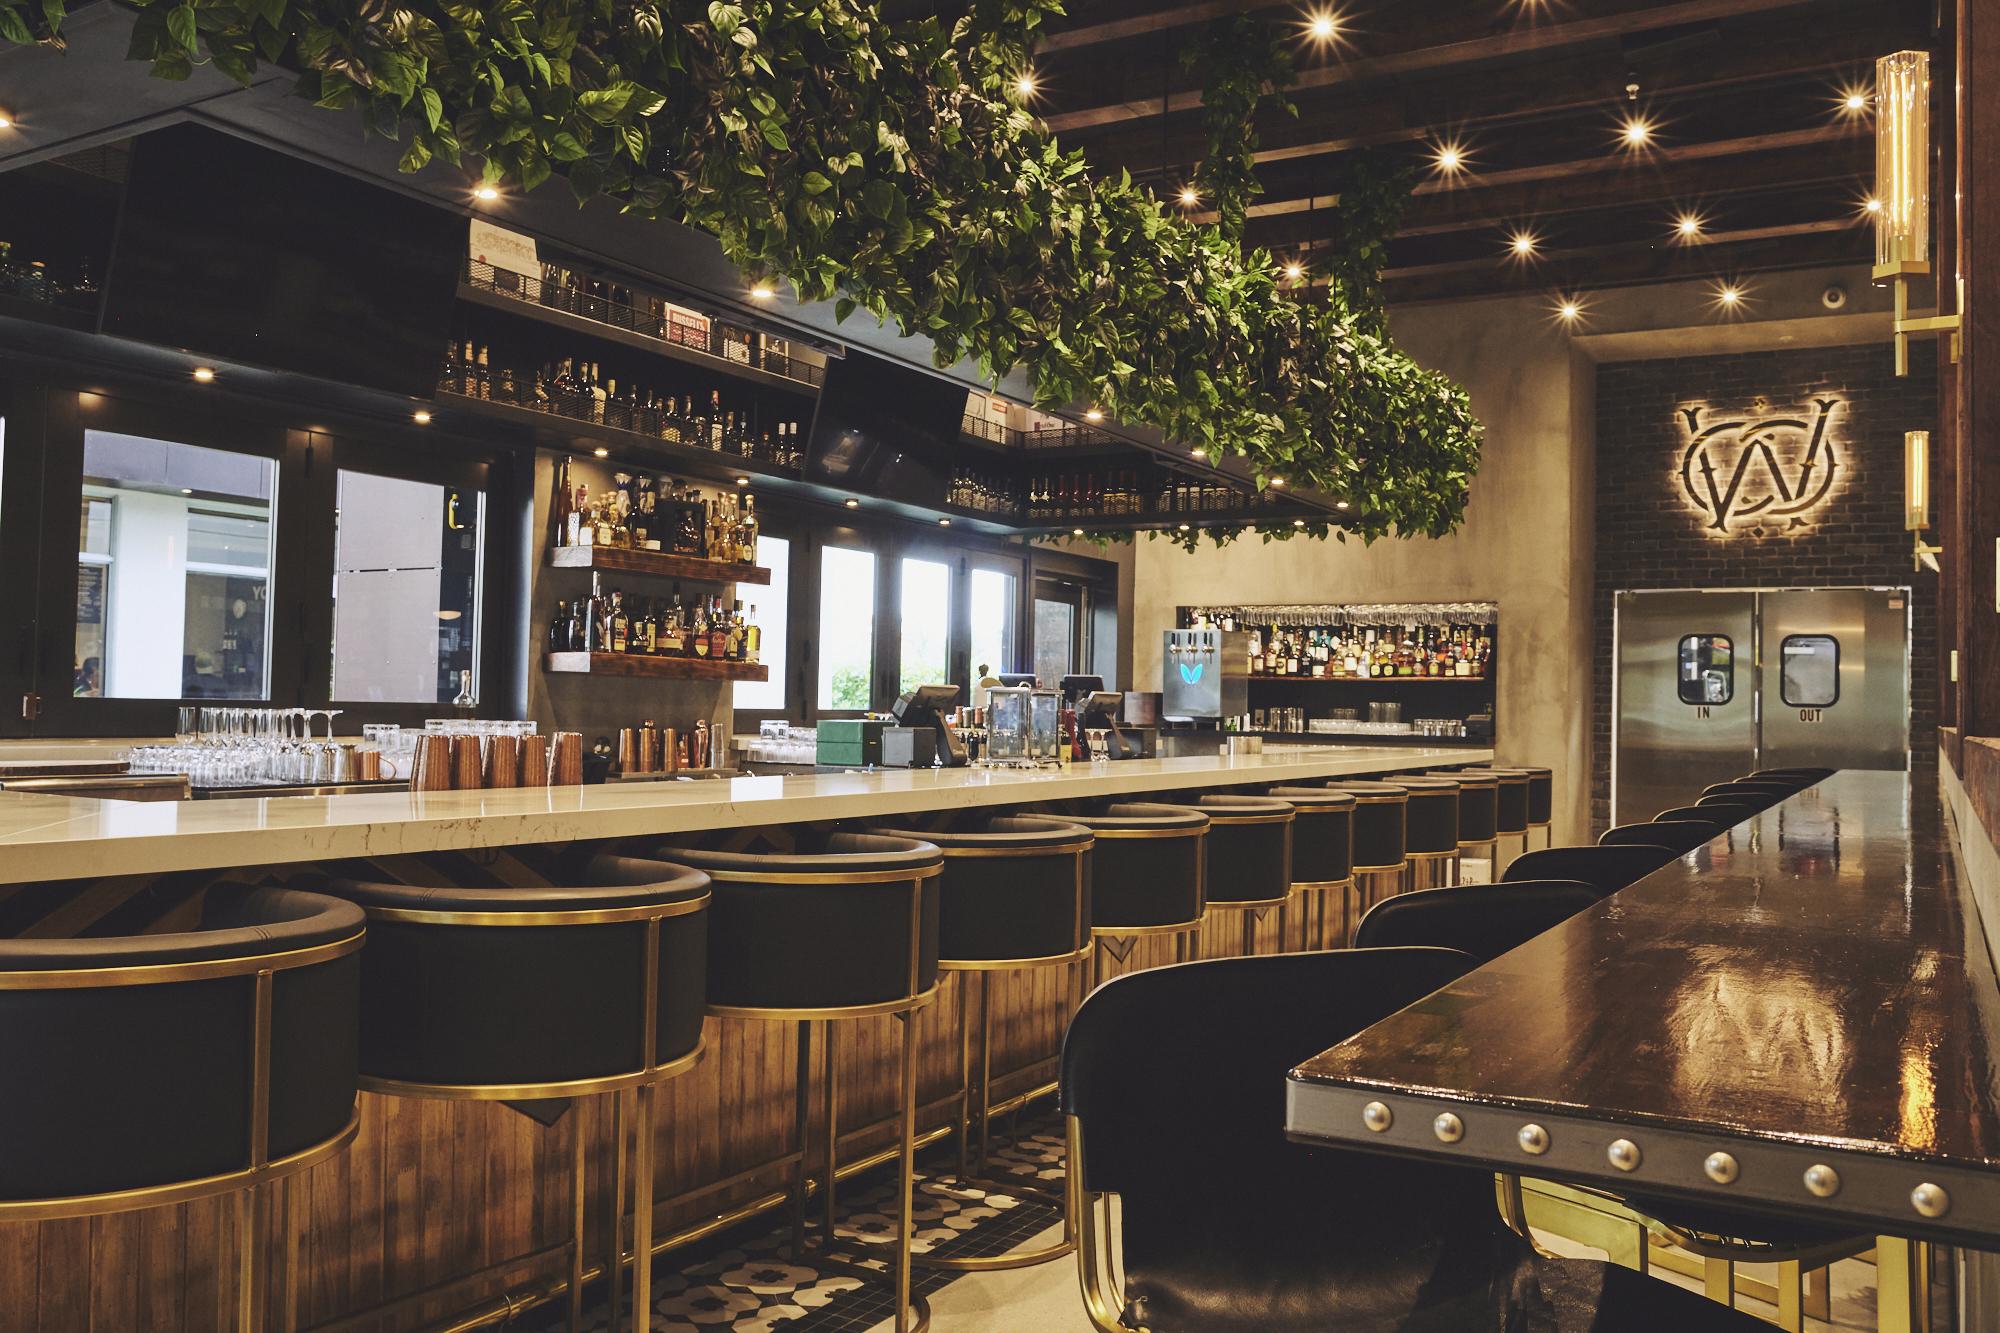 An image of the Trellis Bar at Warren Delray